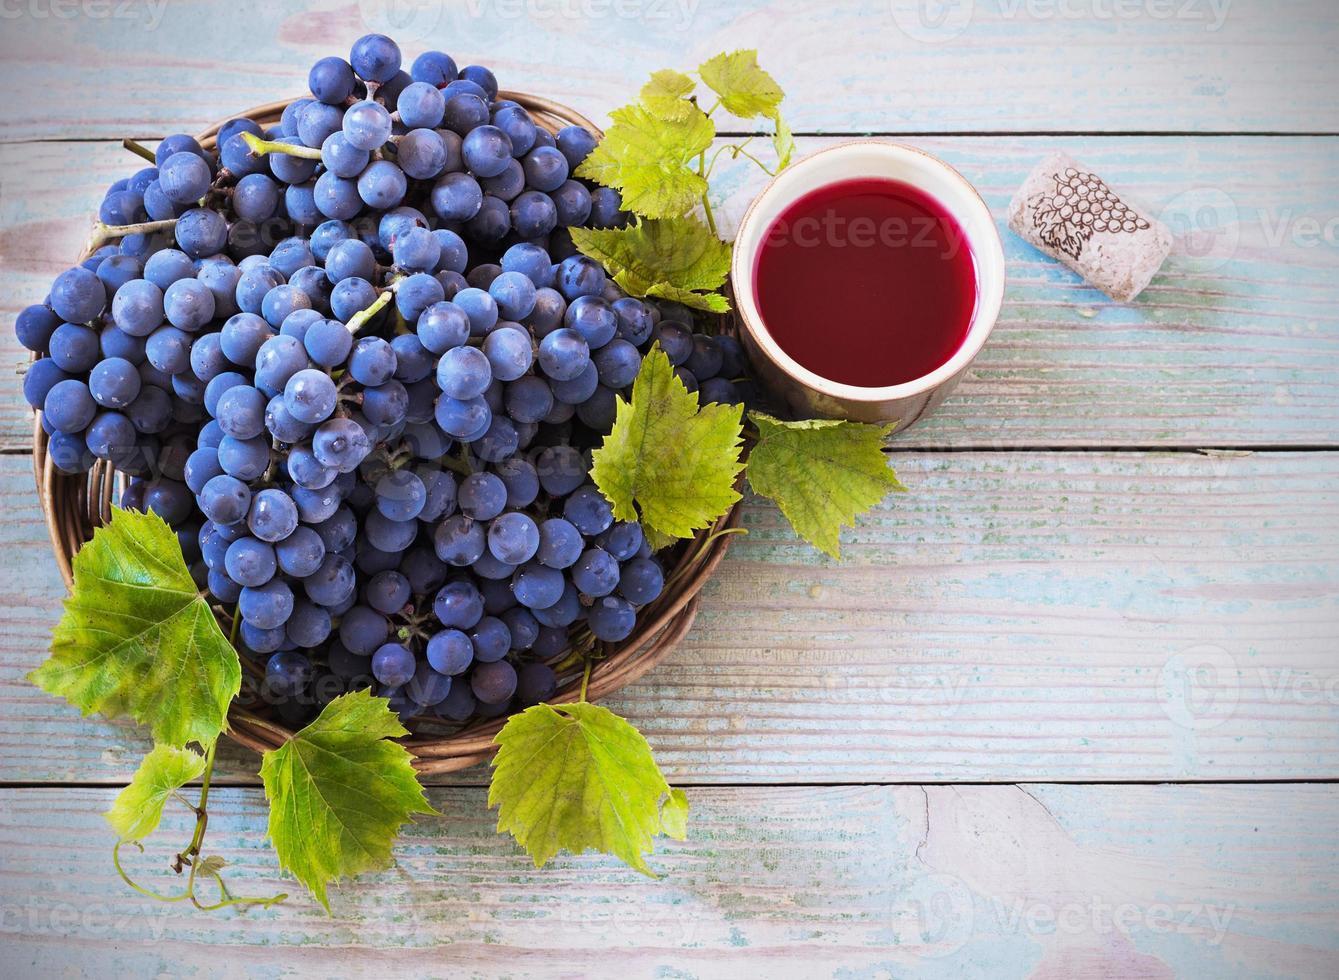 rode wijn en druiven in vintage setting foto